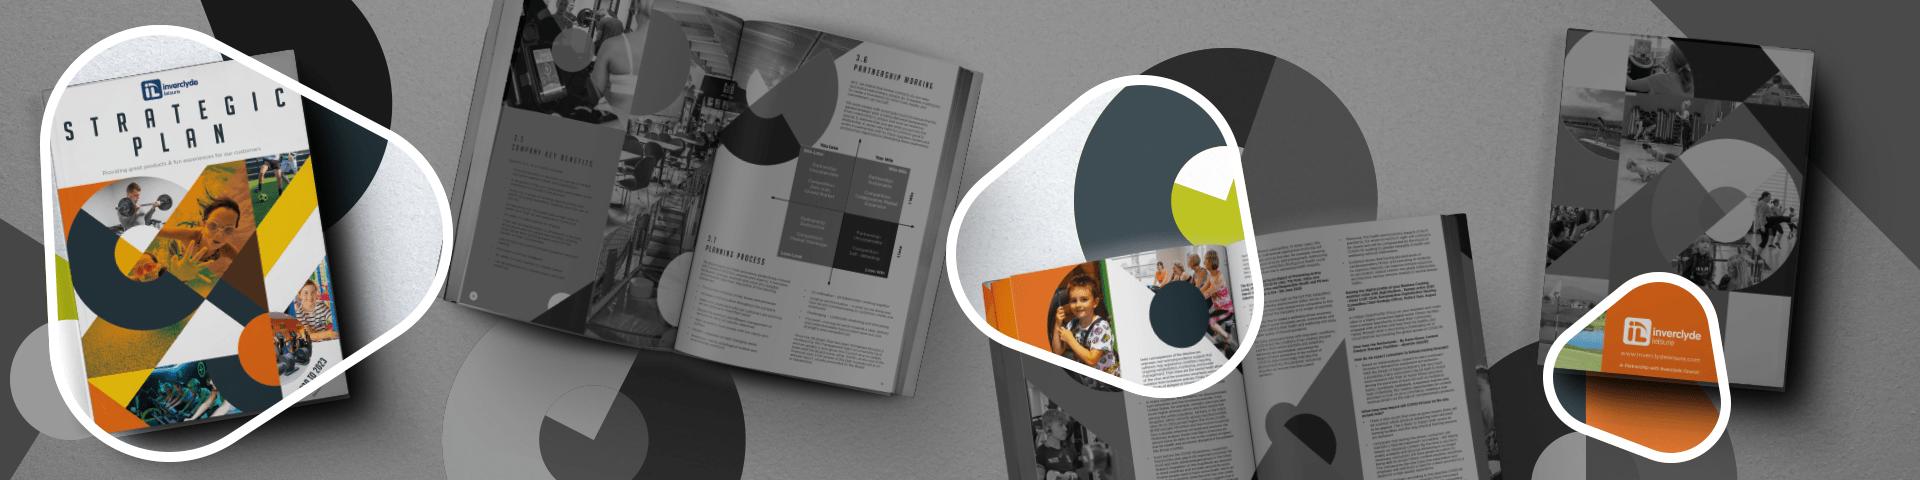 Print Design Bigwave Media Feature Image